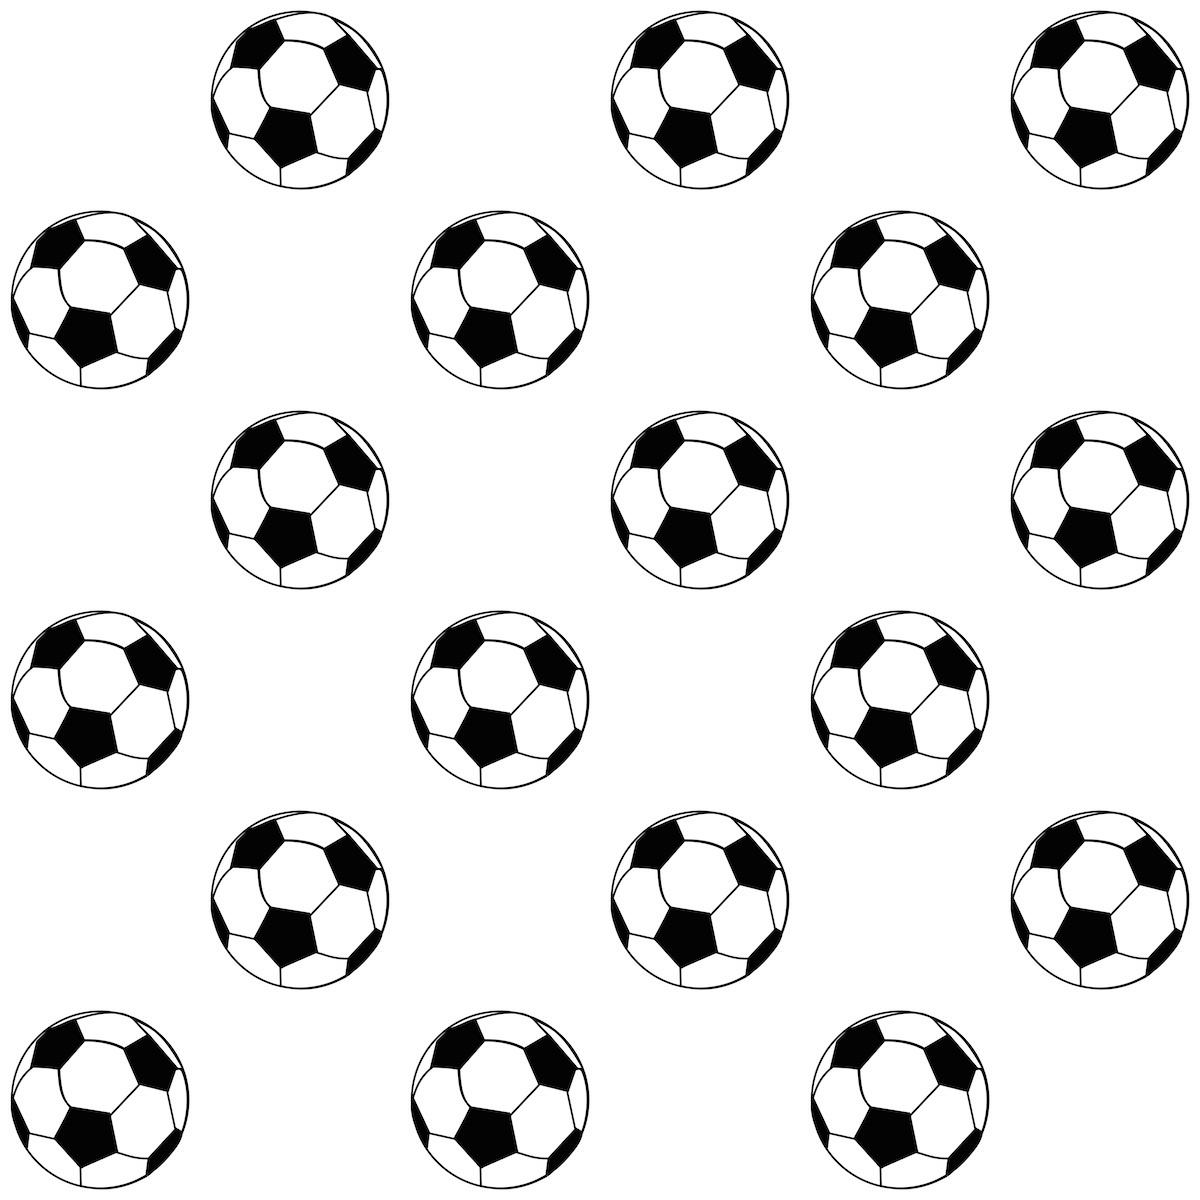 Printable Footballs | Free Download Best Printable Footballs On - Free Printable Football Cutouts